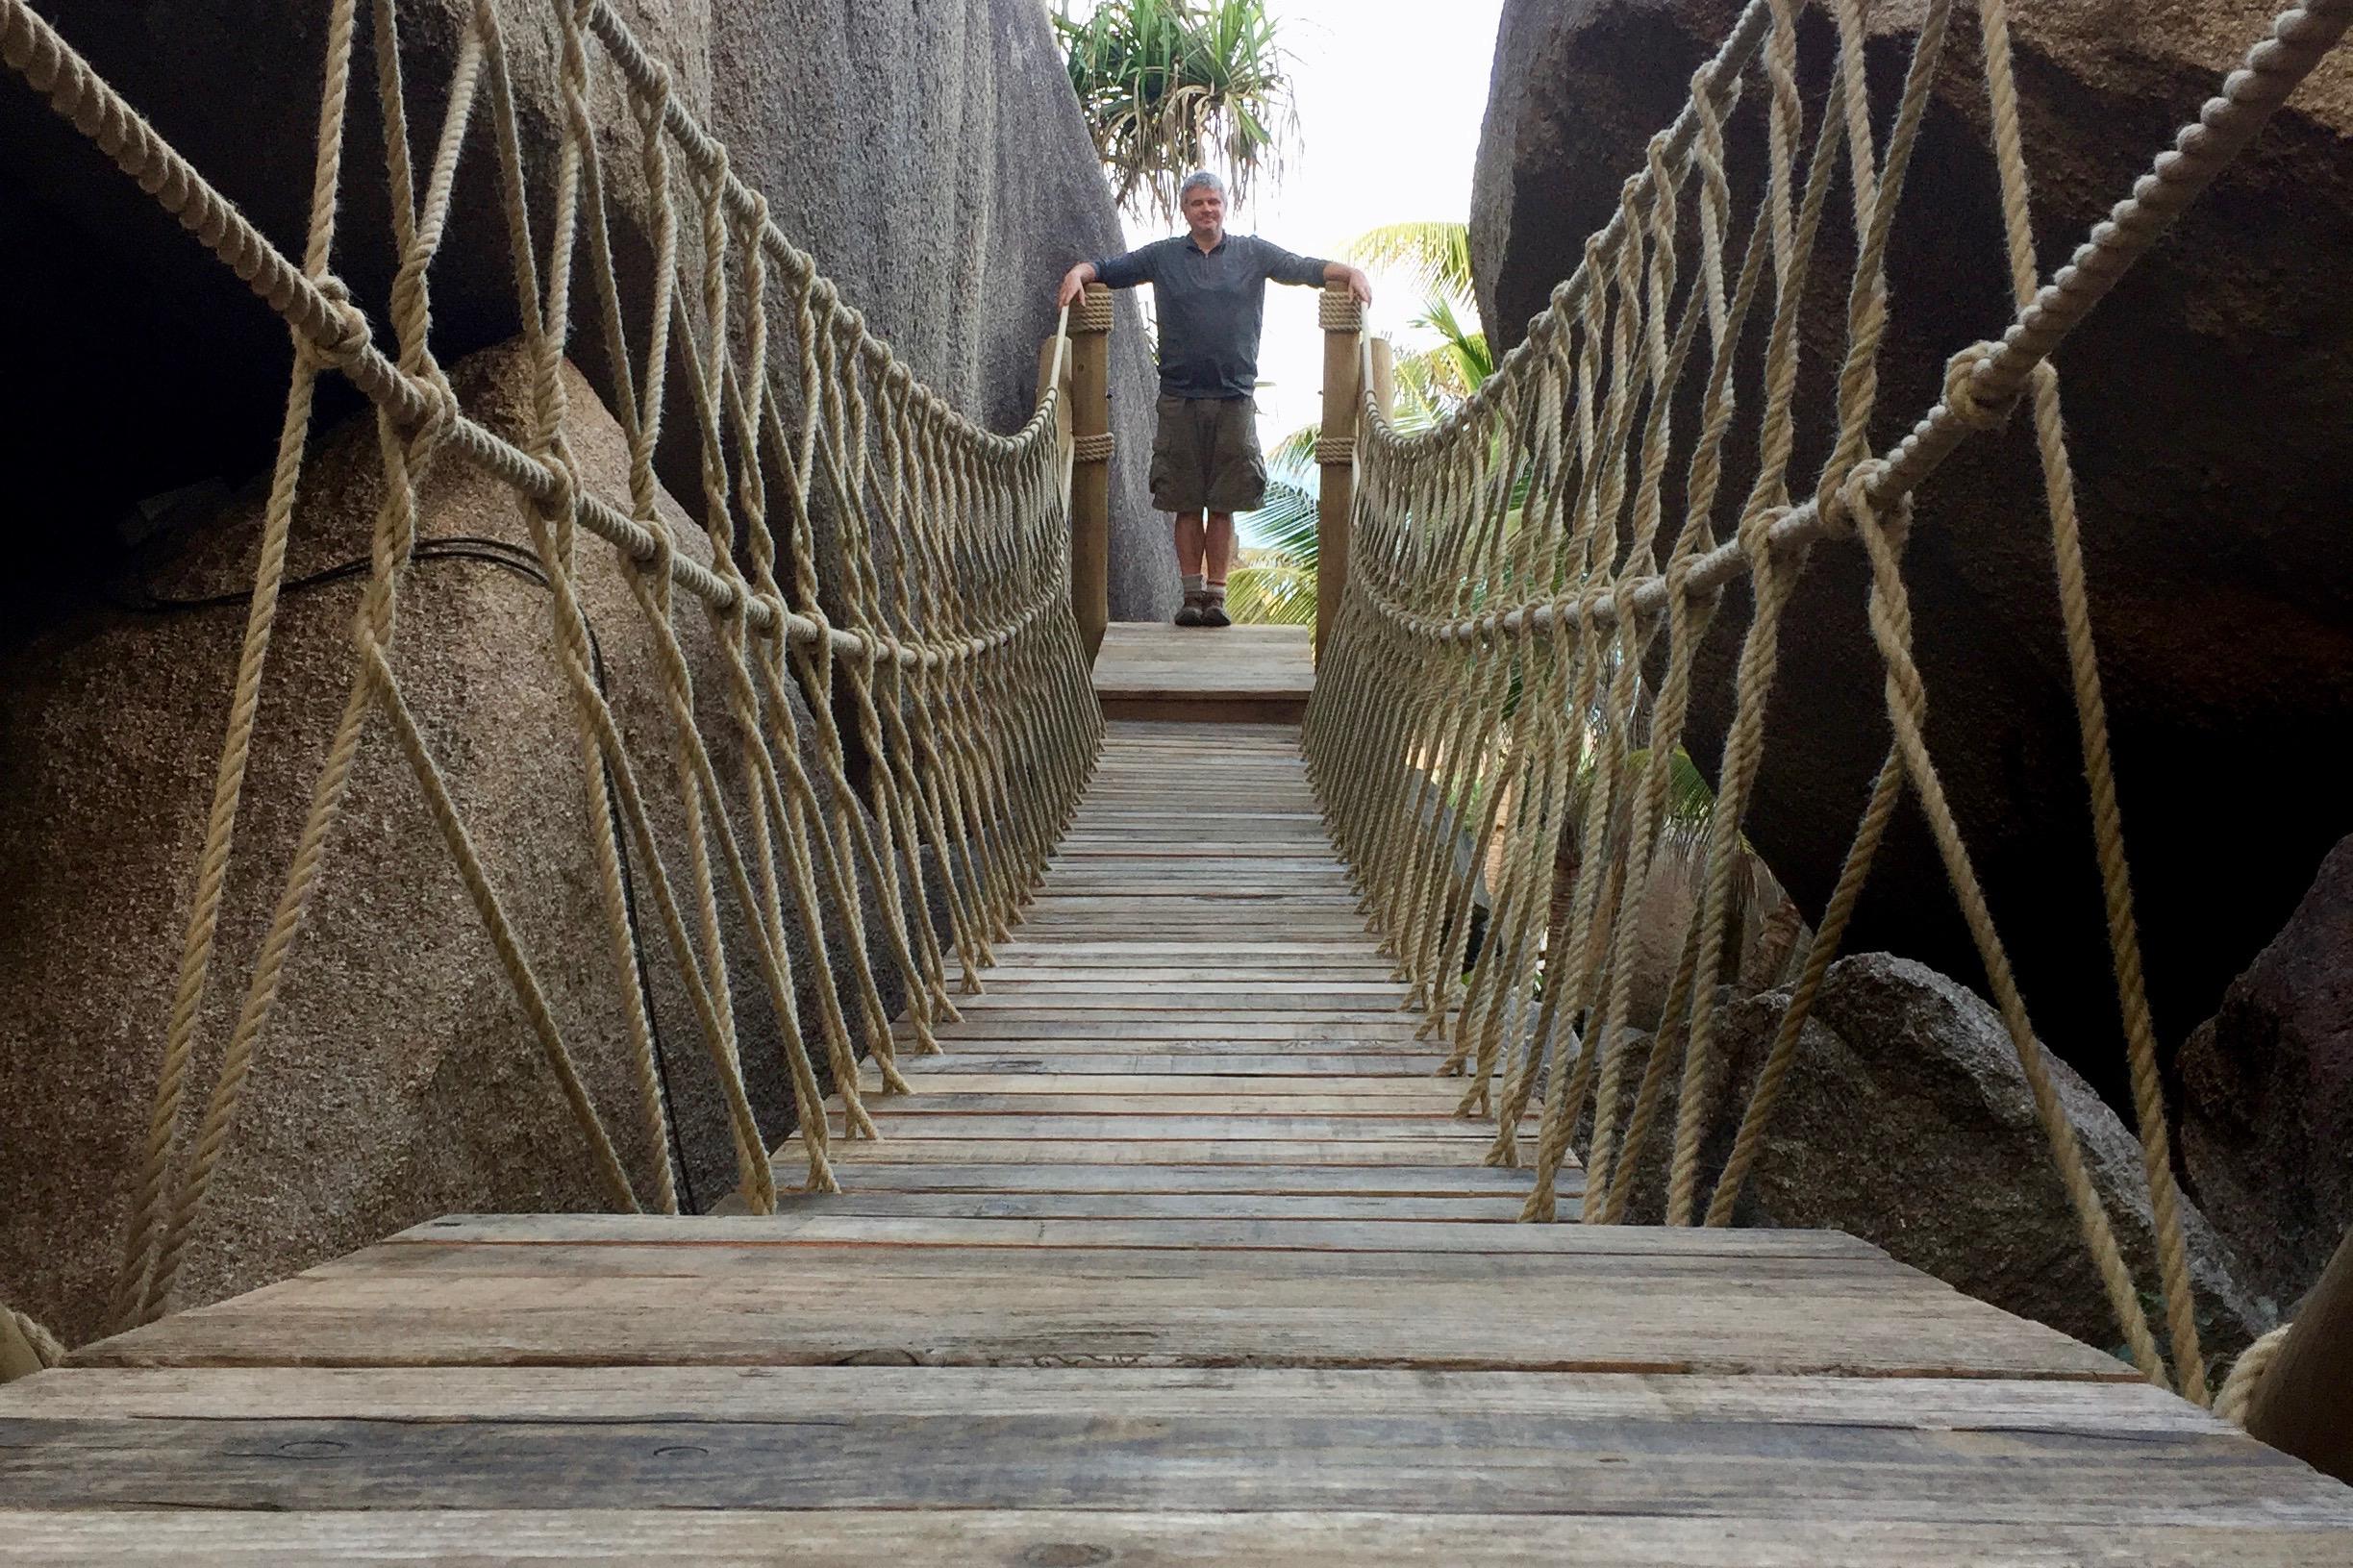 Rope Bridge created by Paul Cameron